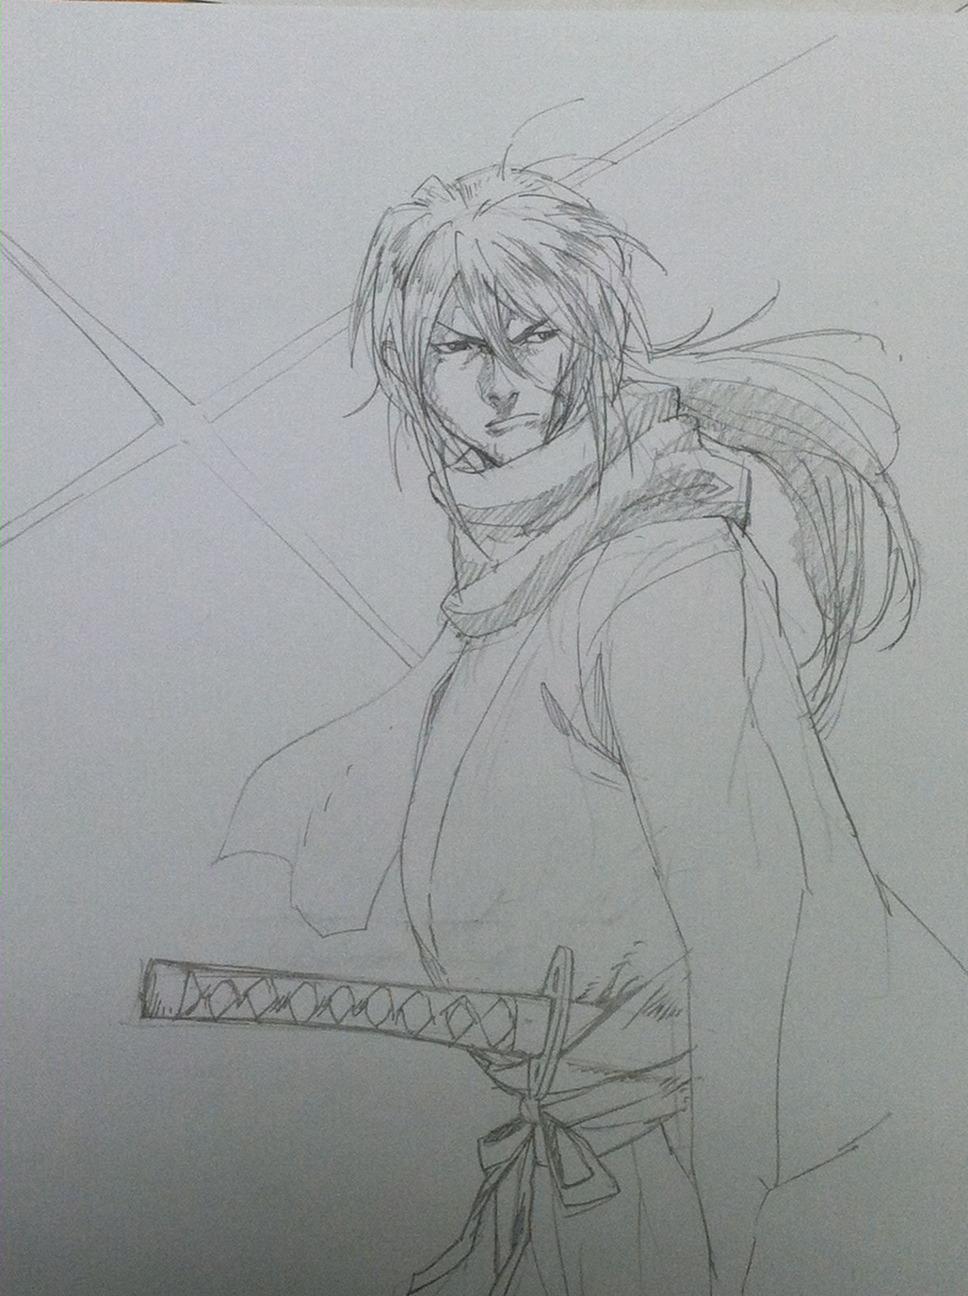 kenshin by tincan21